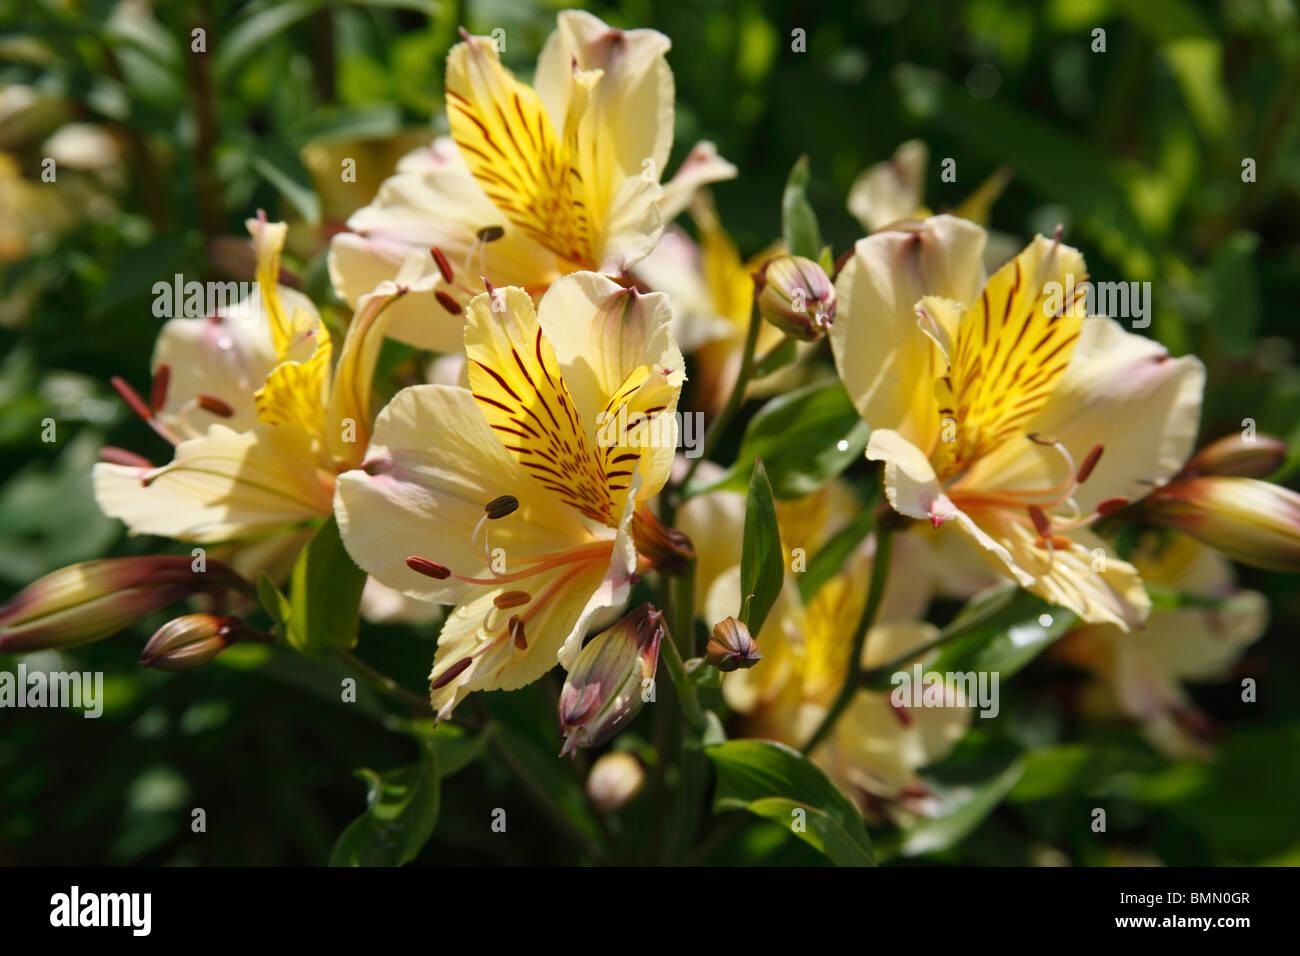 Alstroemeria Friendship close up of flower - Stock Image